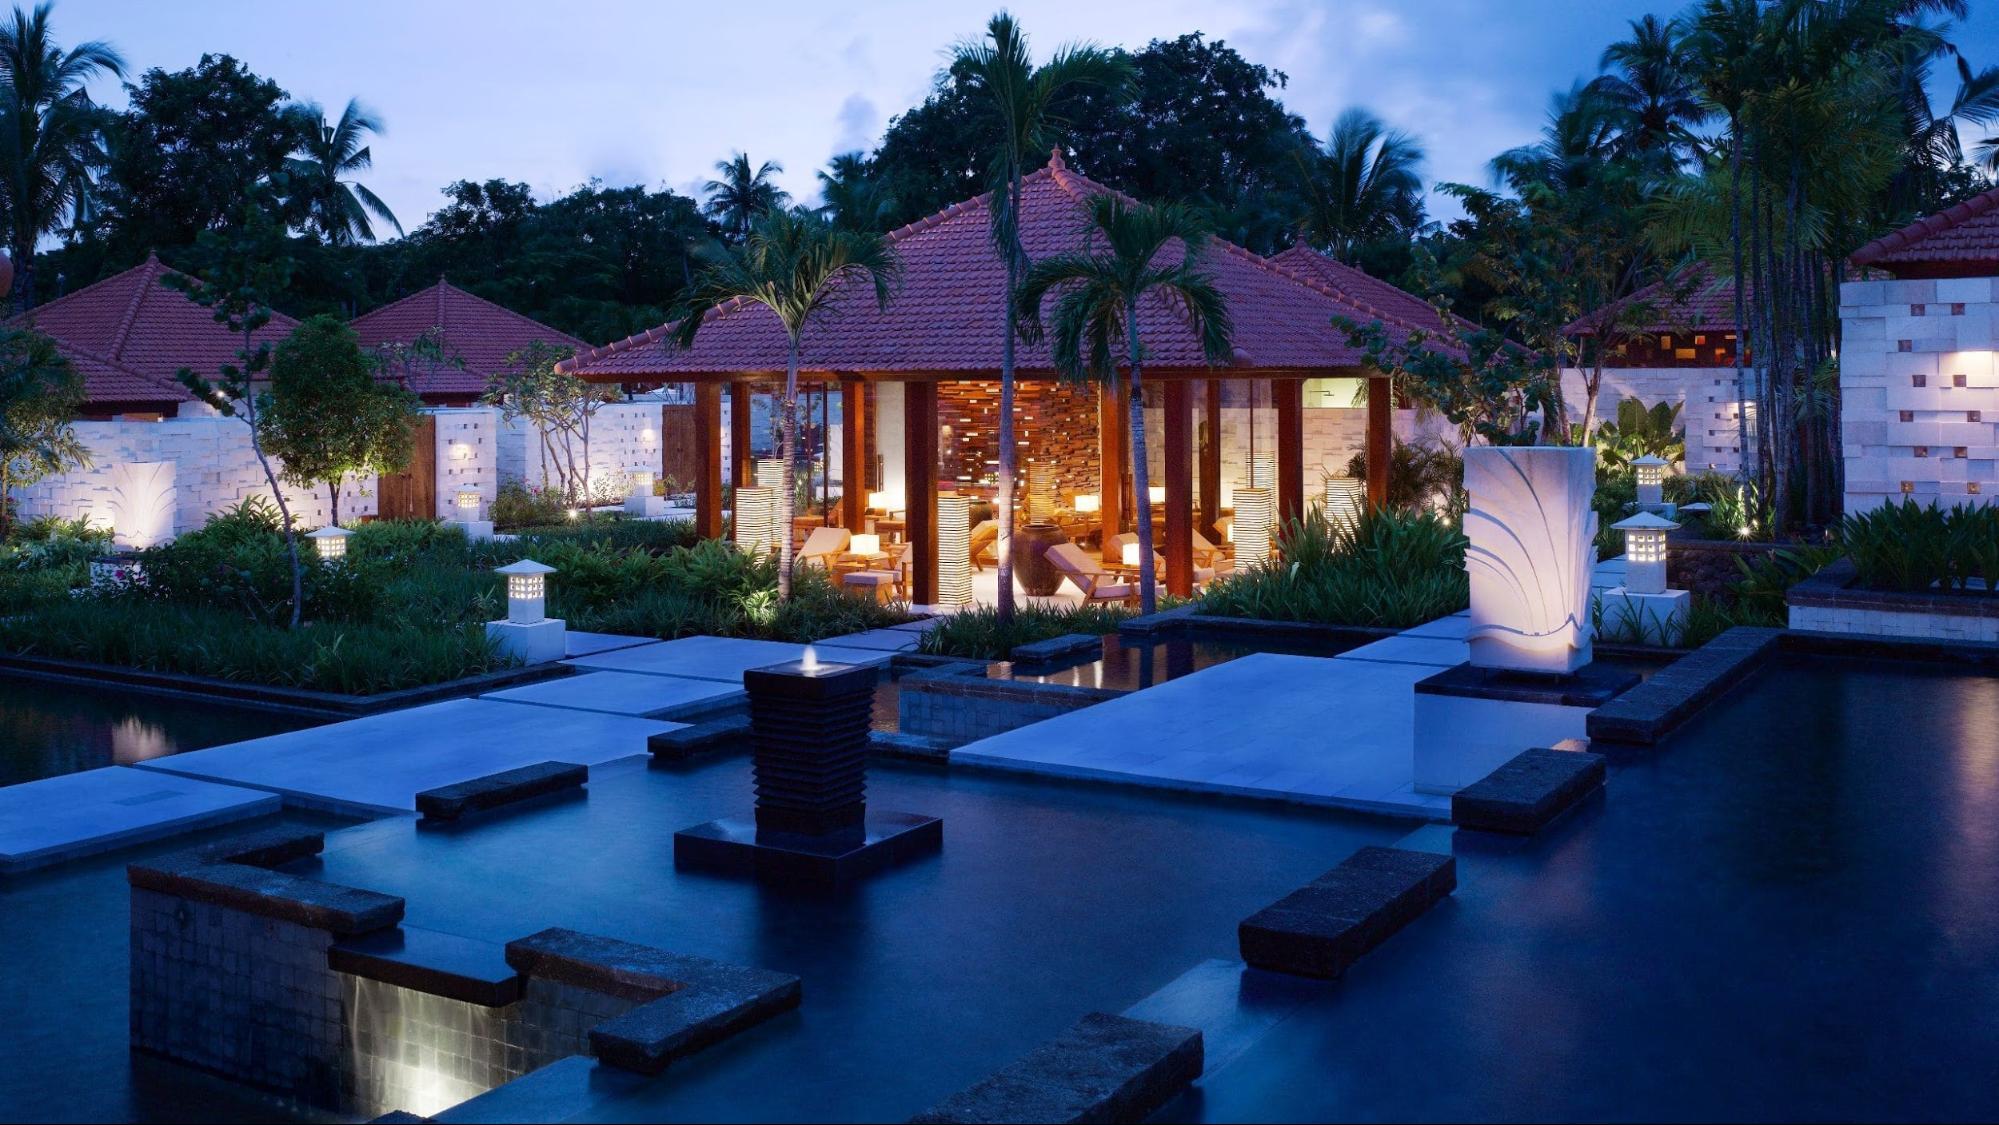 bali luxury hotels - grand hyatt bali kriya spa